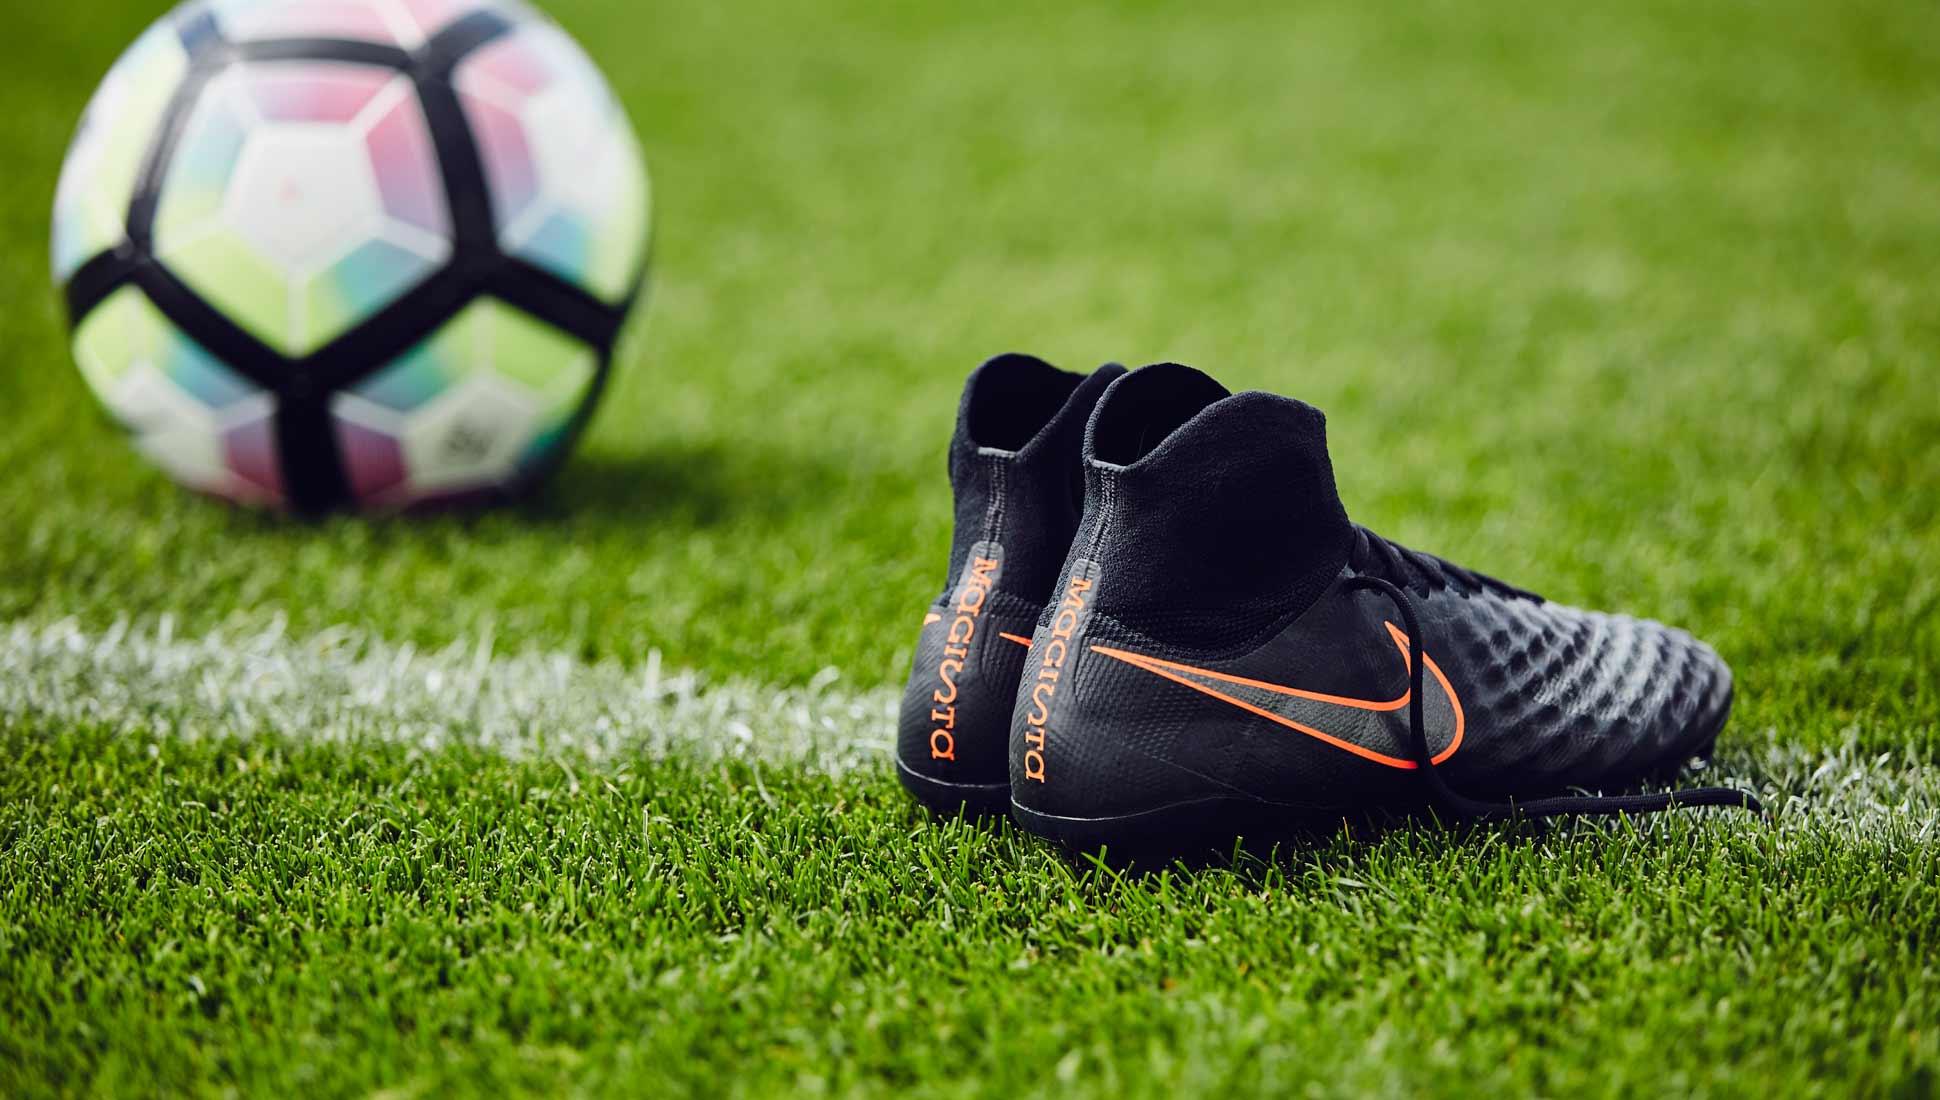 promo code d8f1a f1db2 Nike Magista Obra 2